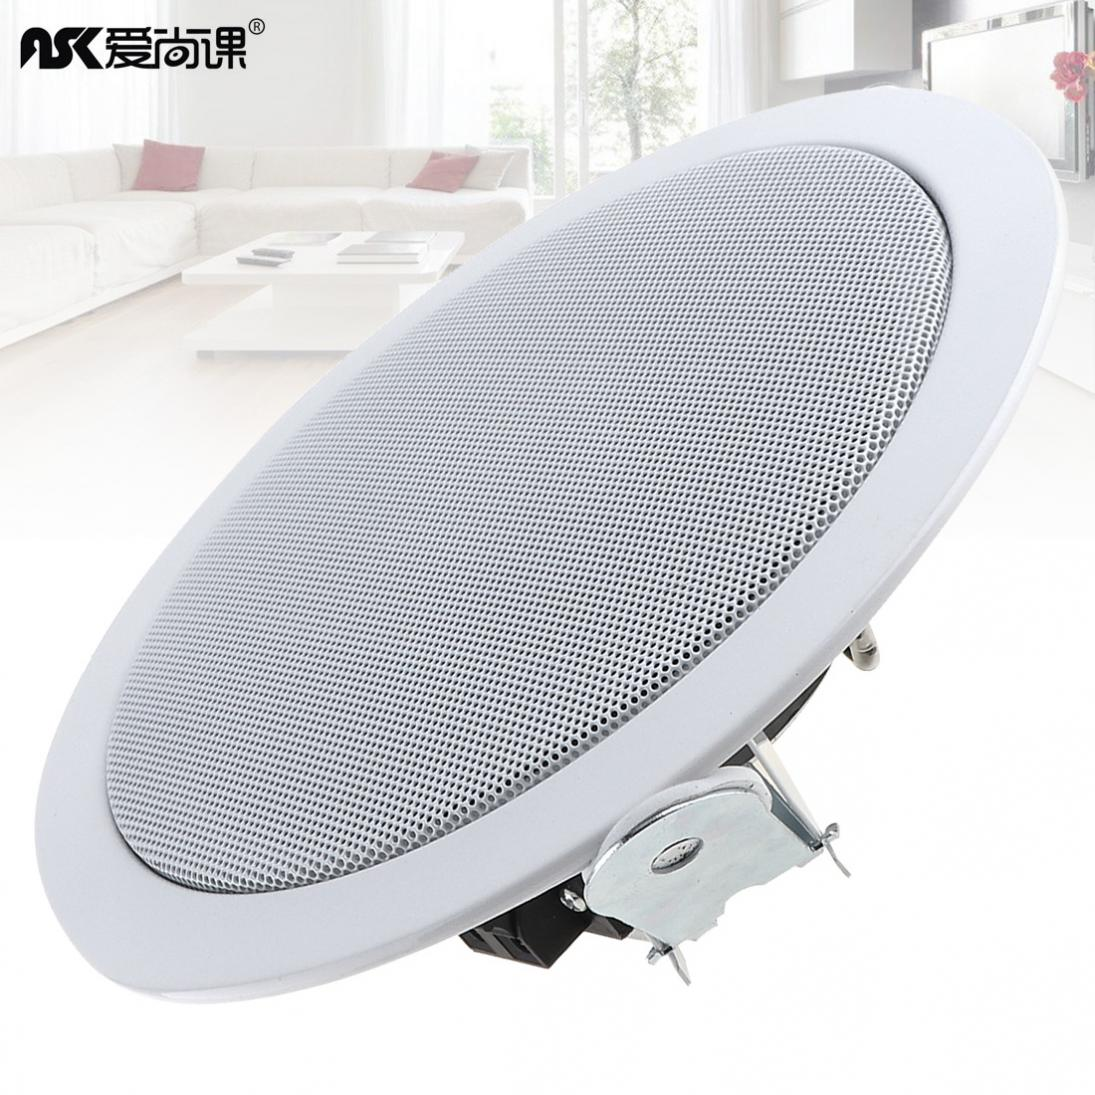 Ask 630 6 Inch 15w Ceiling Speaker Public Broadcast